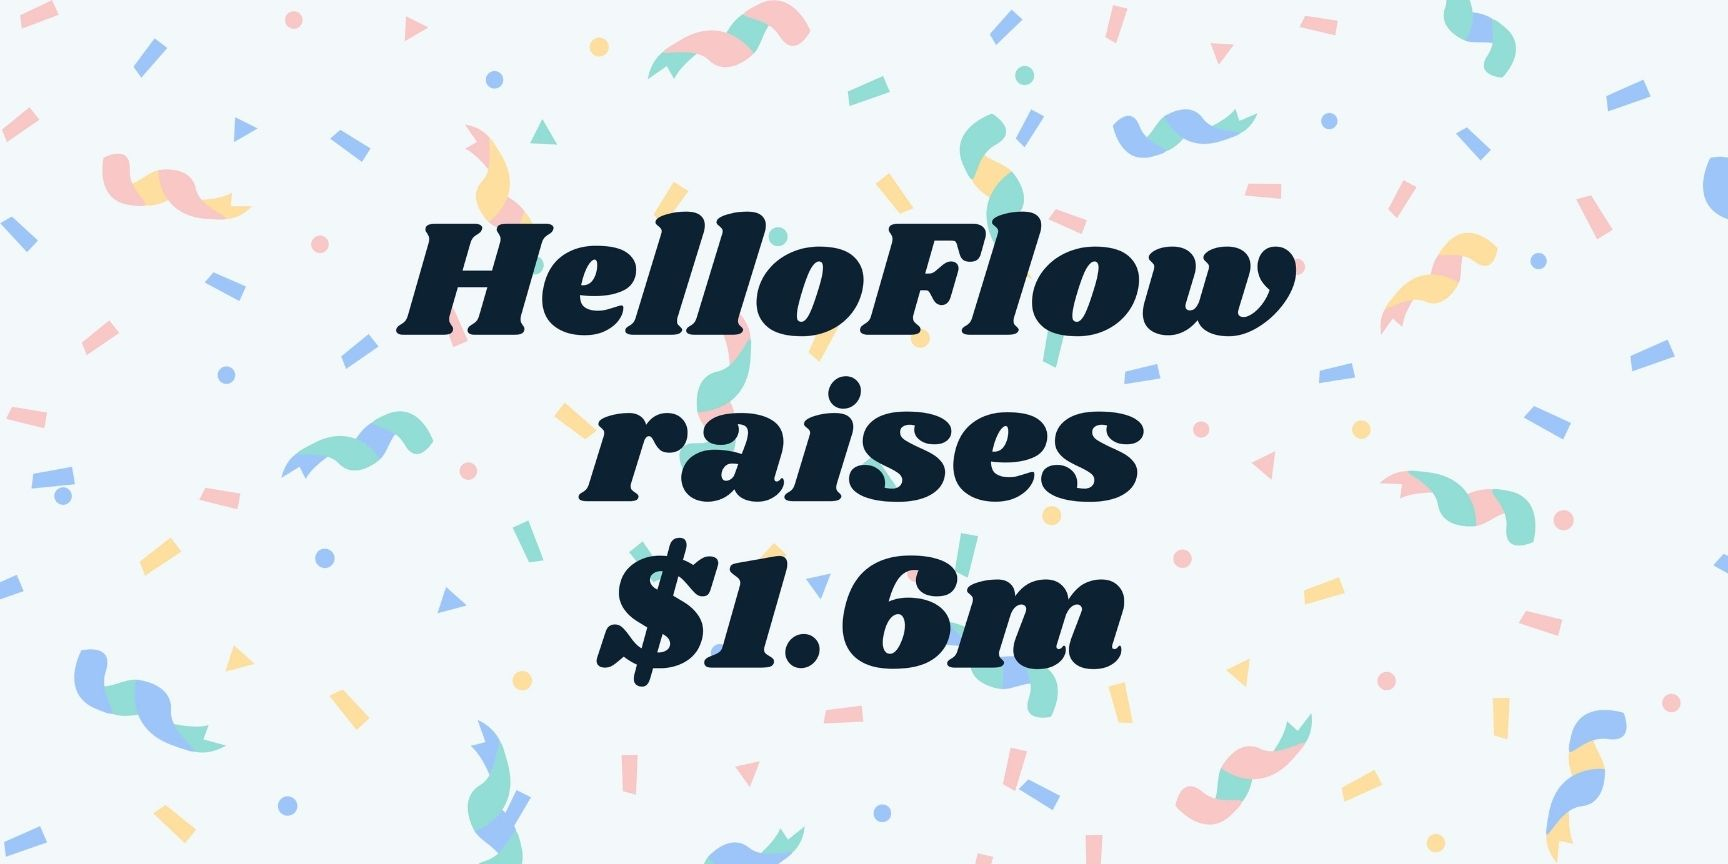 HelloFlow raises $1.6m